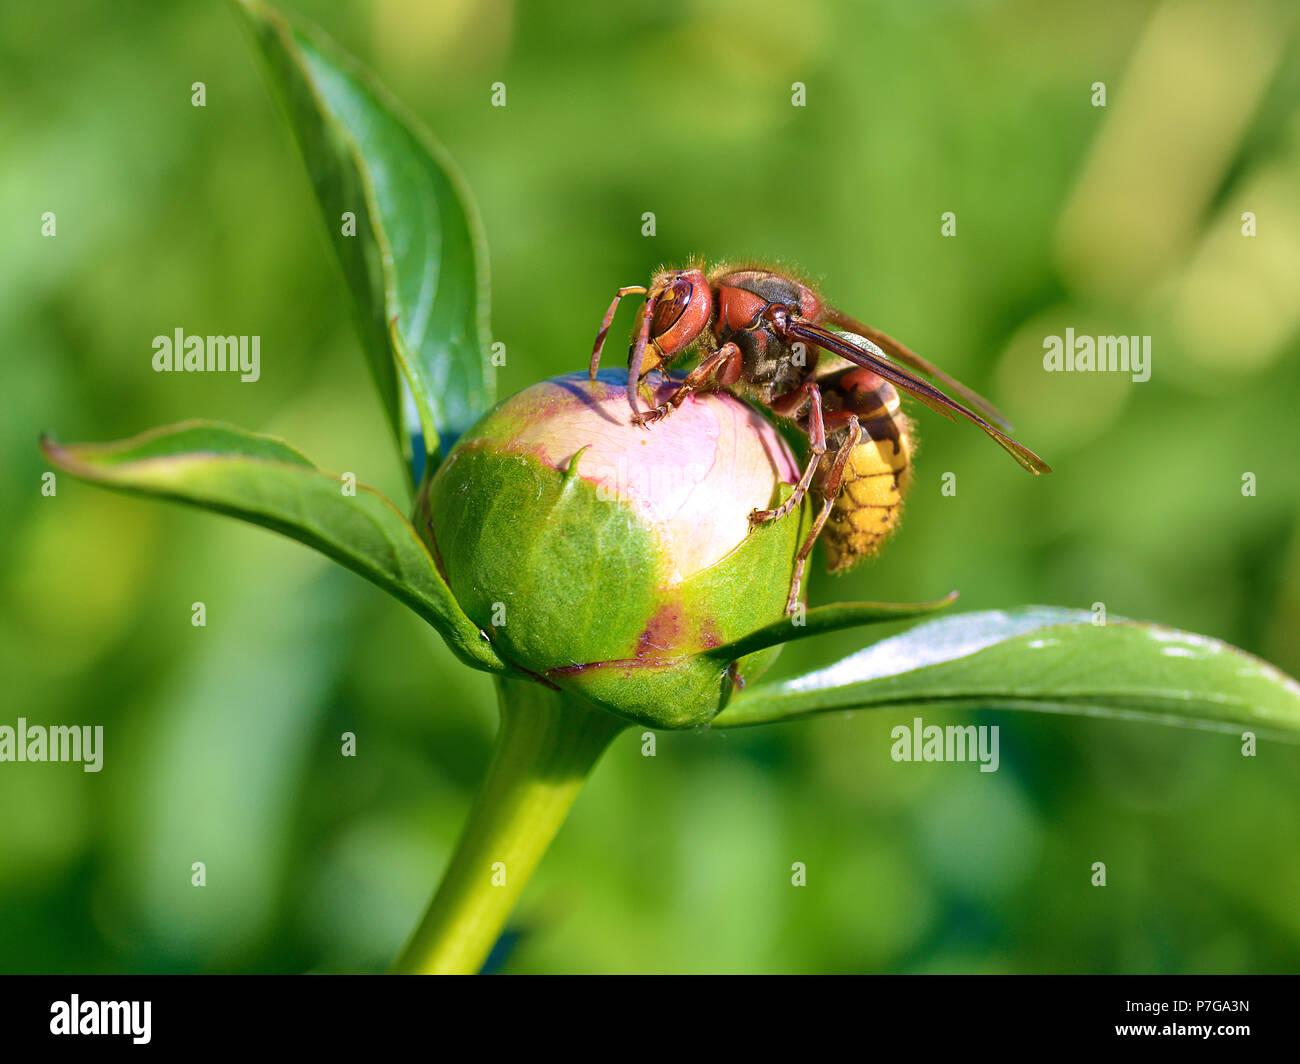 Closeup European hornet (Vespa crabro) on bud of peony flower seen from profile - Stock Image